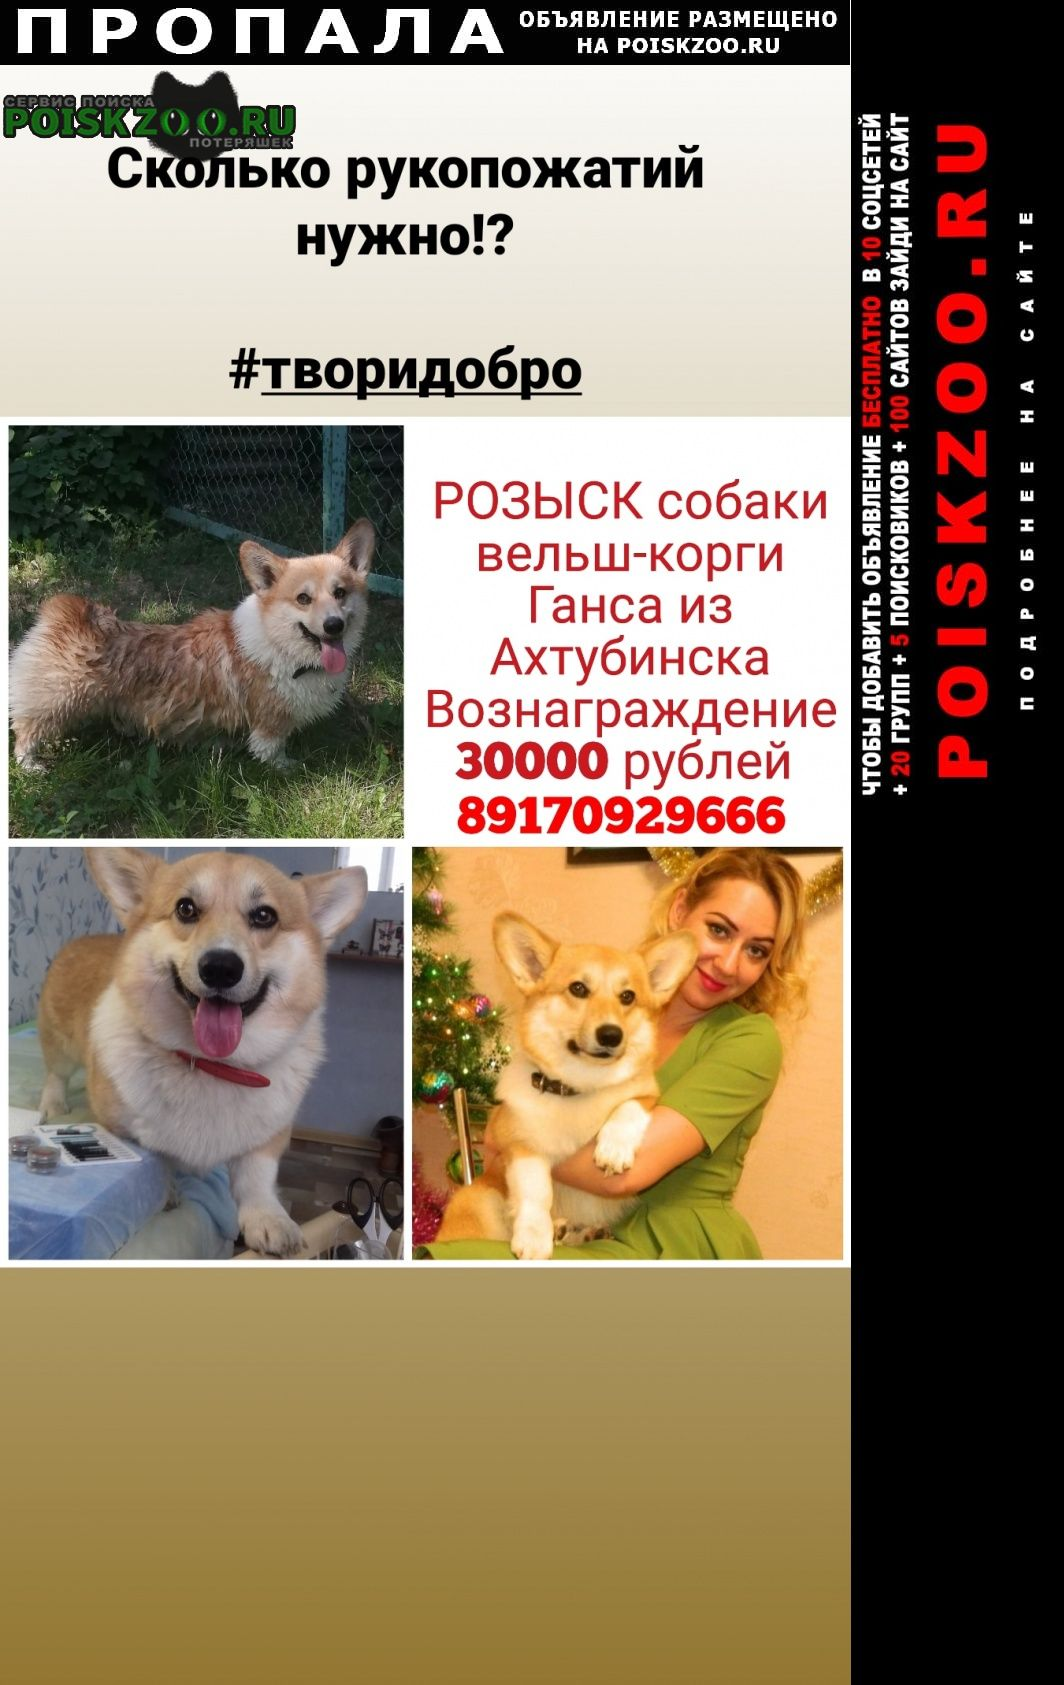 Ахтубинск Пропала собака вельш-корги